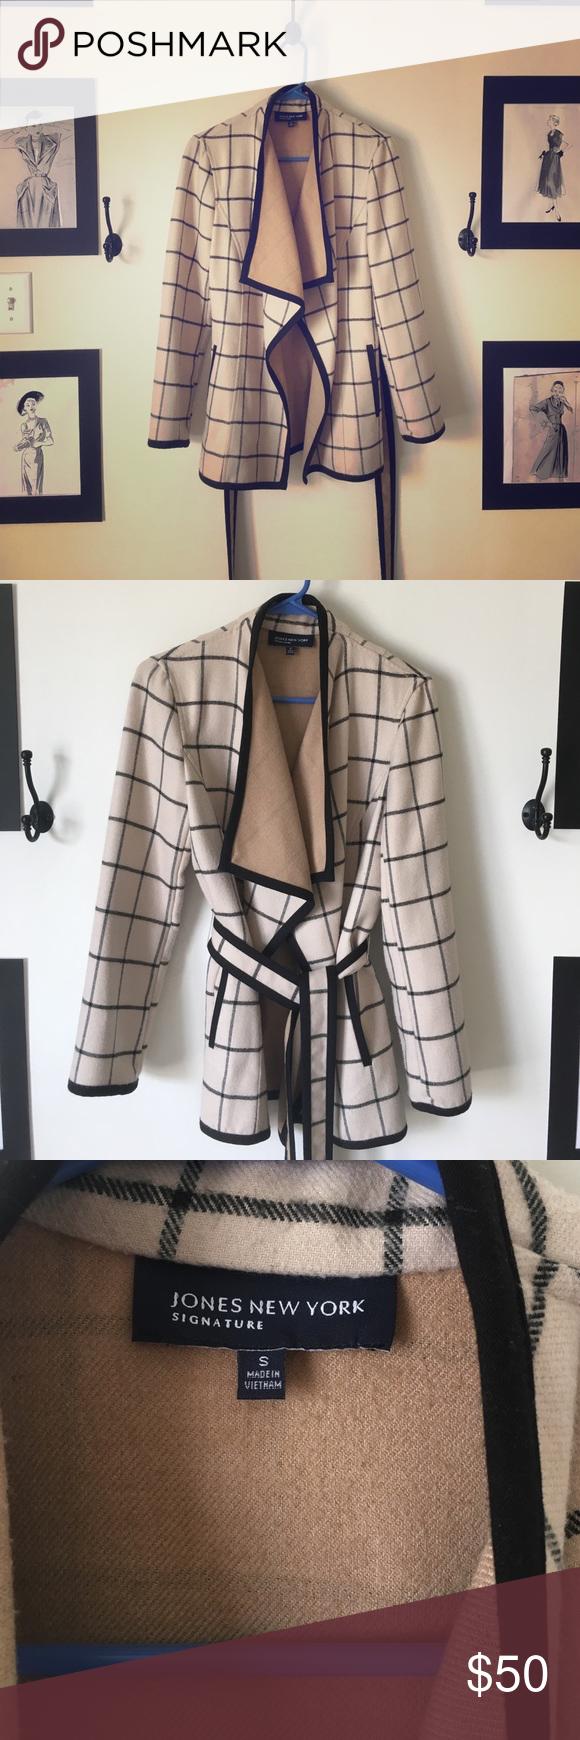 Jones New York sweater coat Great condition. Plaid light jacket. Jones New York Jackets & Coats